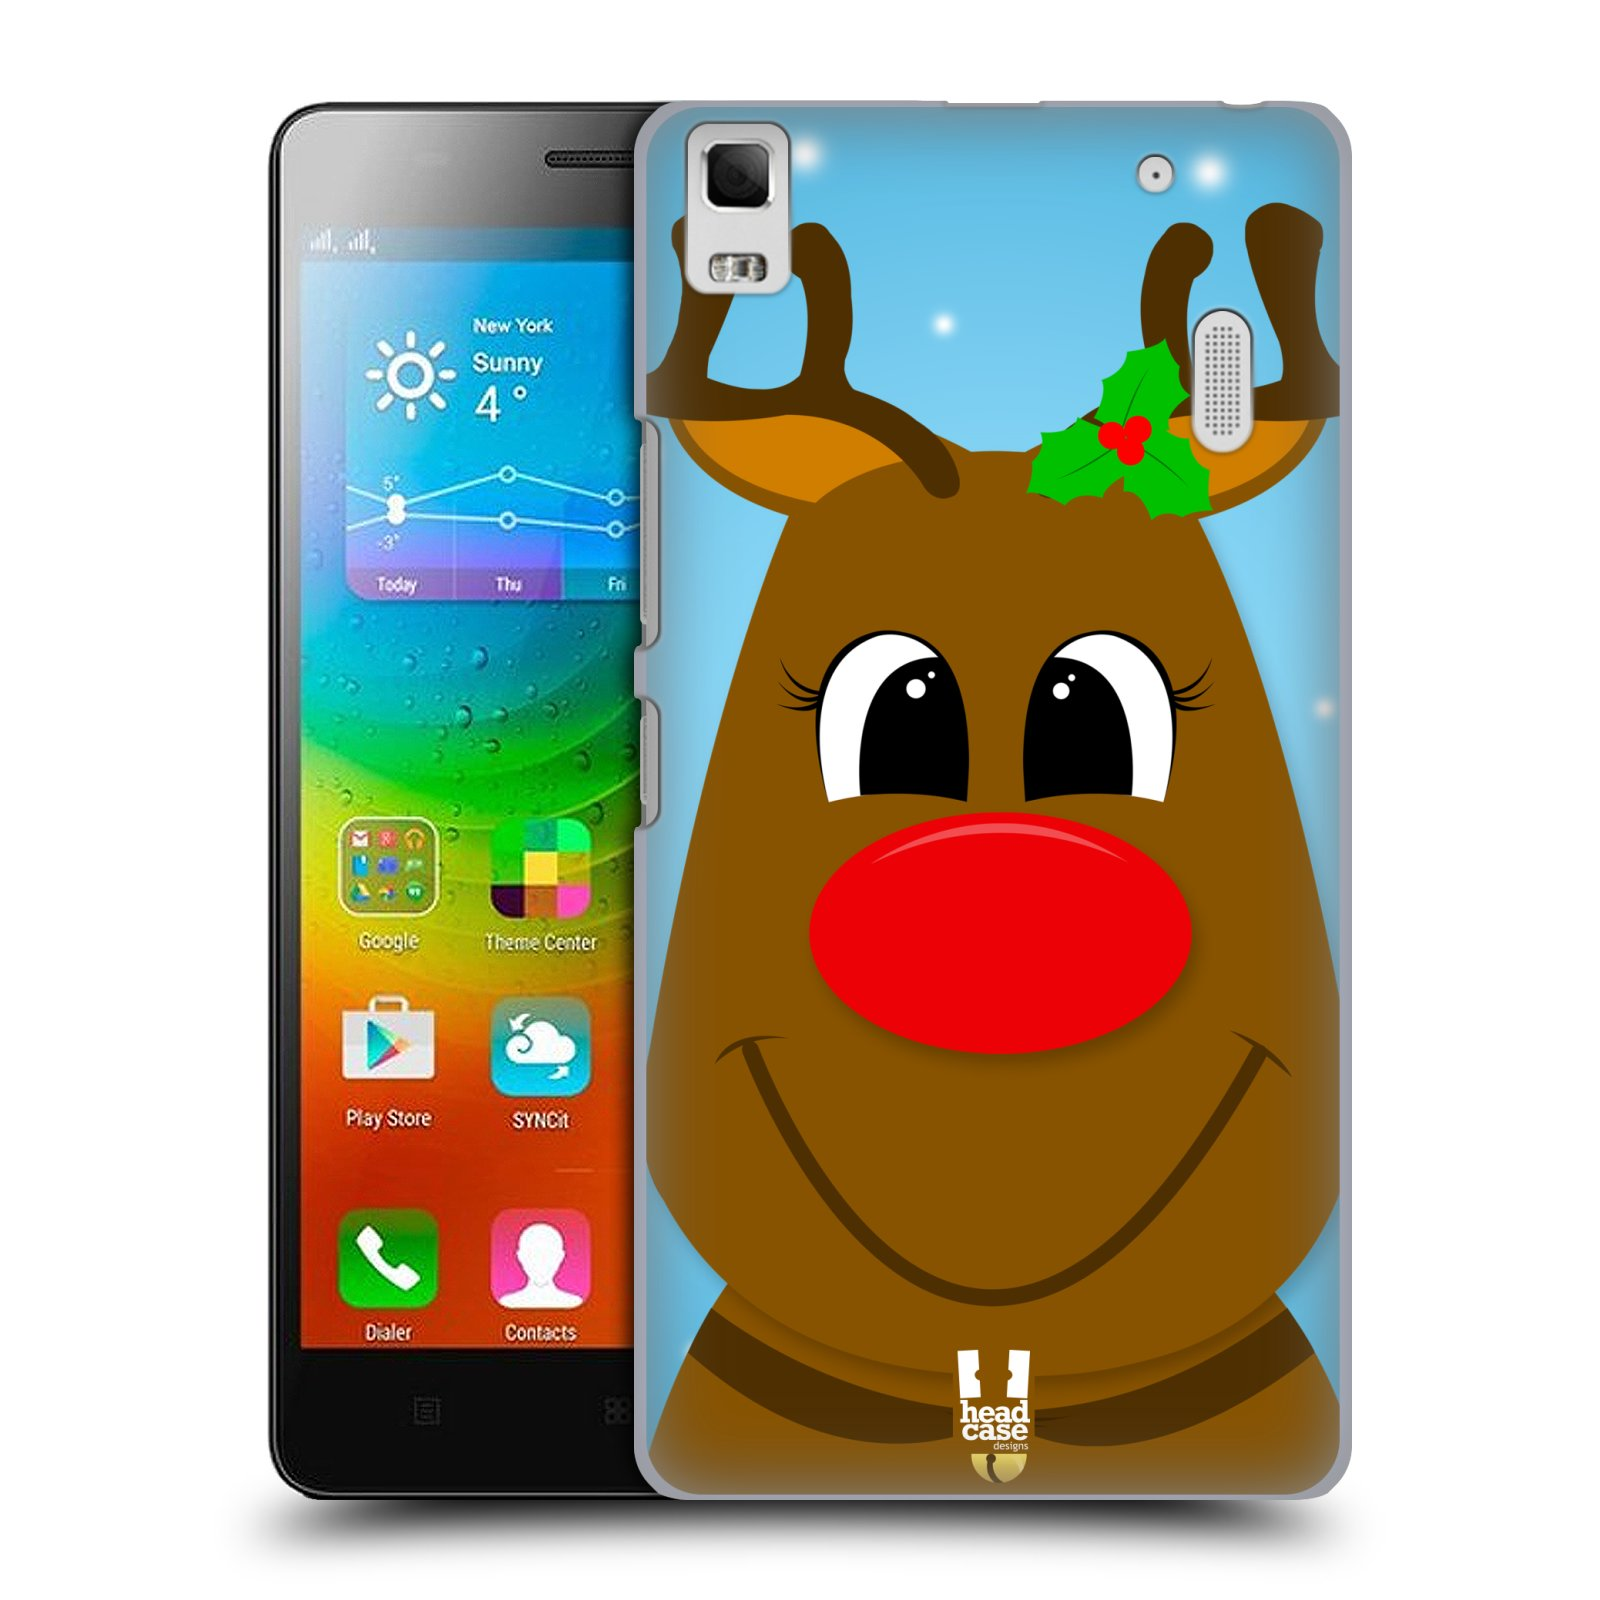 HEAD CASE pevný plastový obal na mobil LENOVO A7000 / A7000 DUAL / K3 NOTE vzor Vánoční tváře kreslené SOB RUDOLF